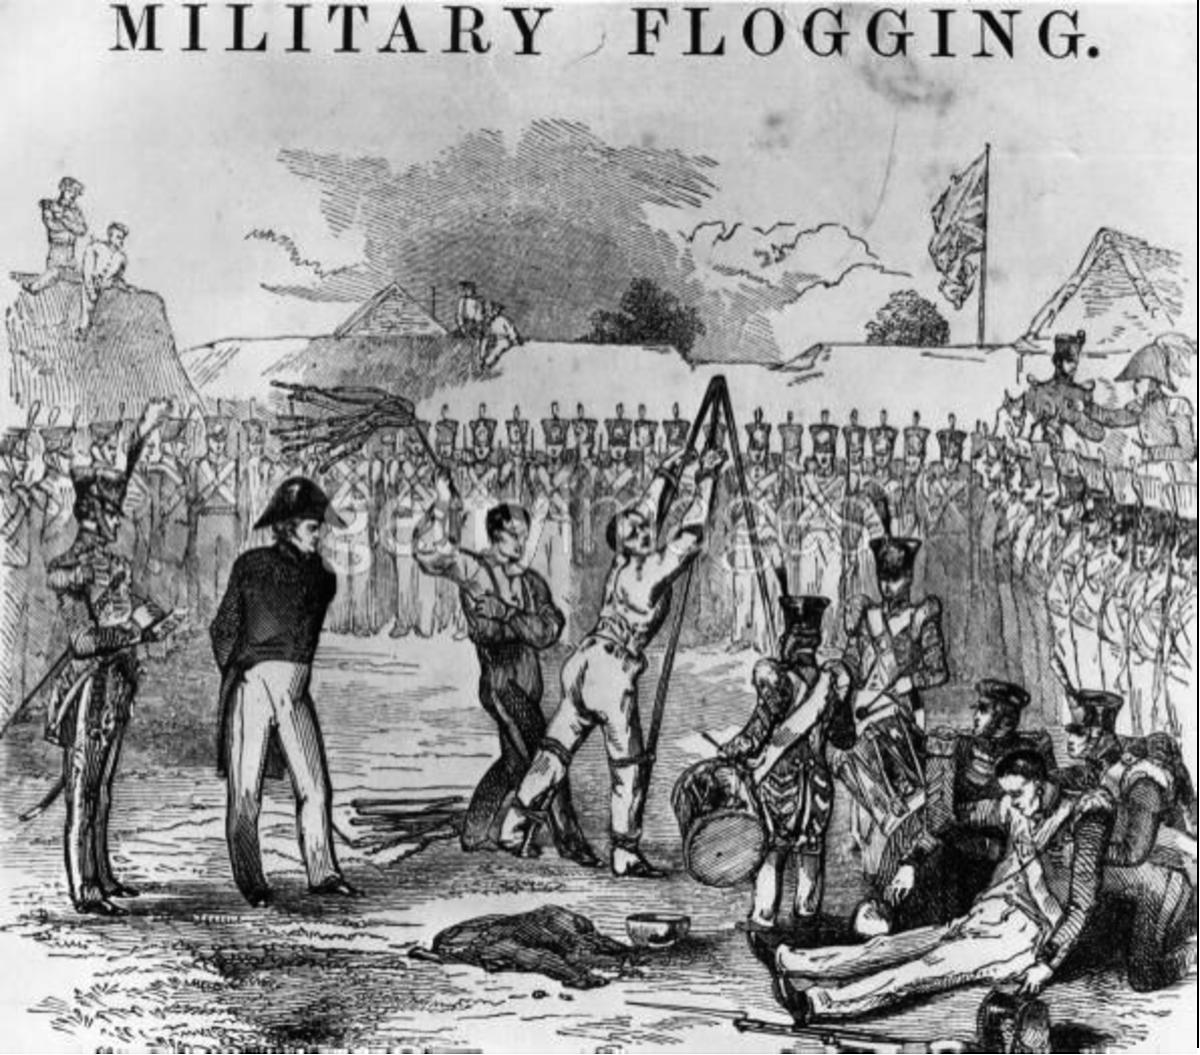 Military Flogging